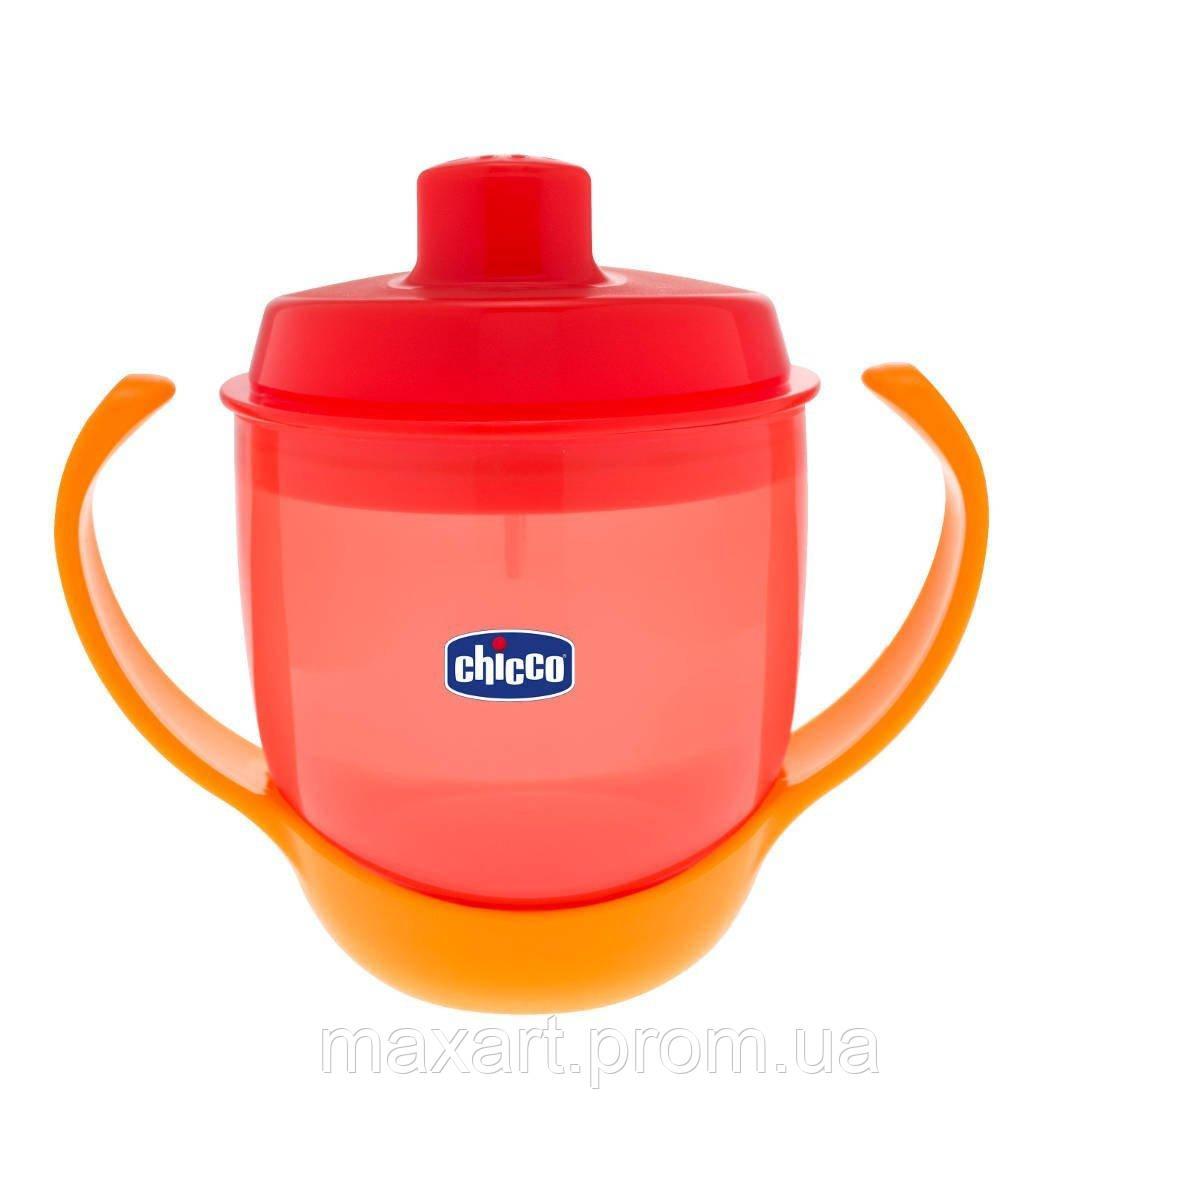 Чашка-непроливайка Chicco - Meal Cup (06824.70) 180 мл, 12 мес.+, оранжевый